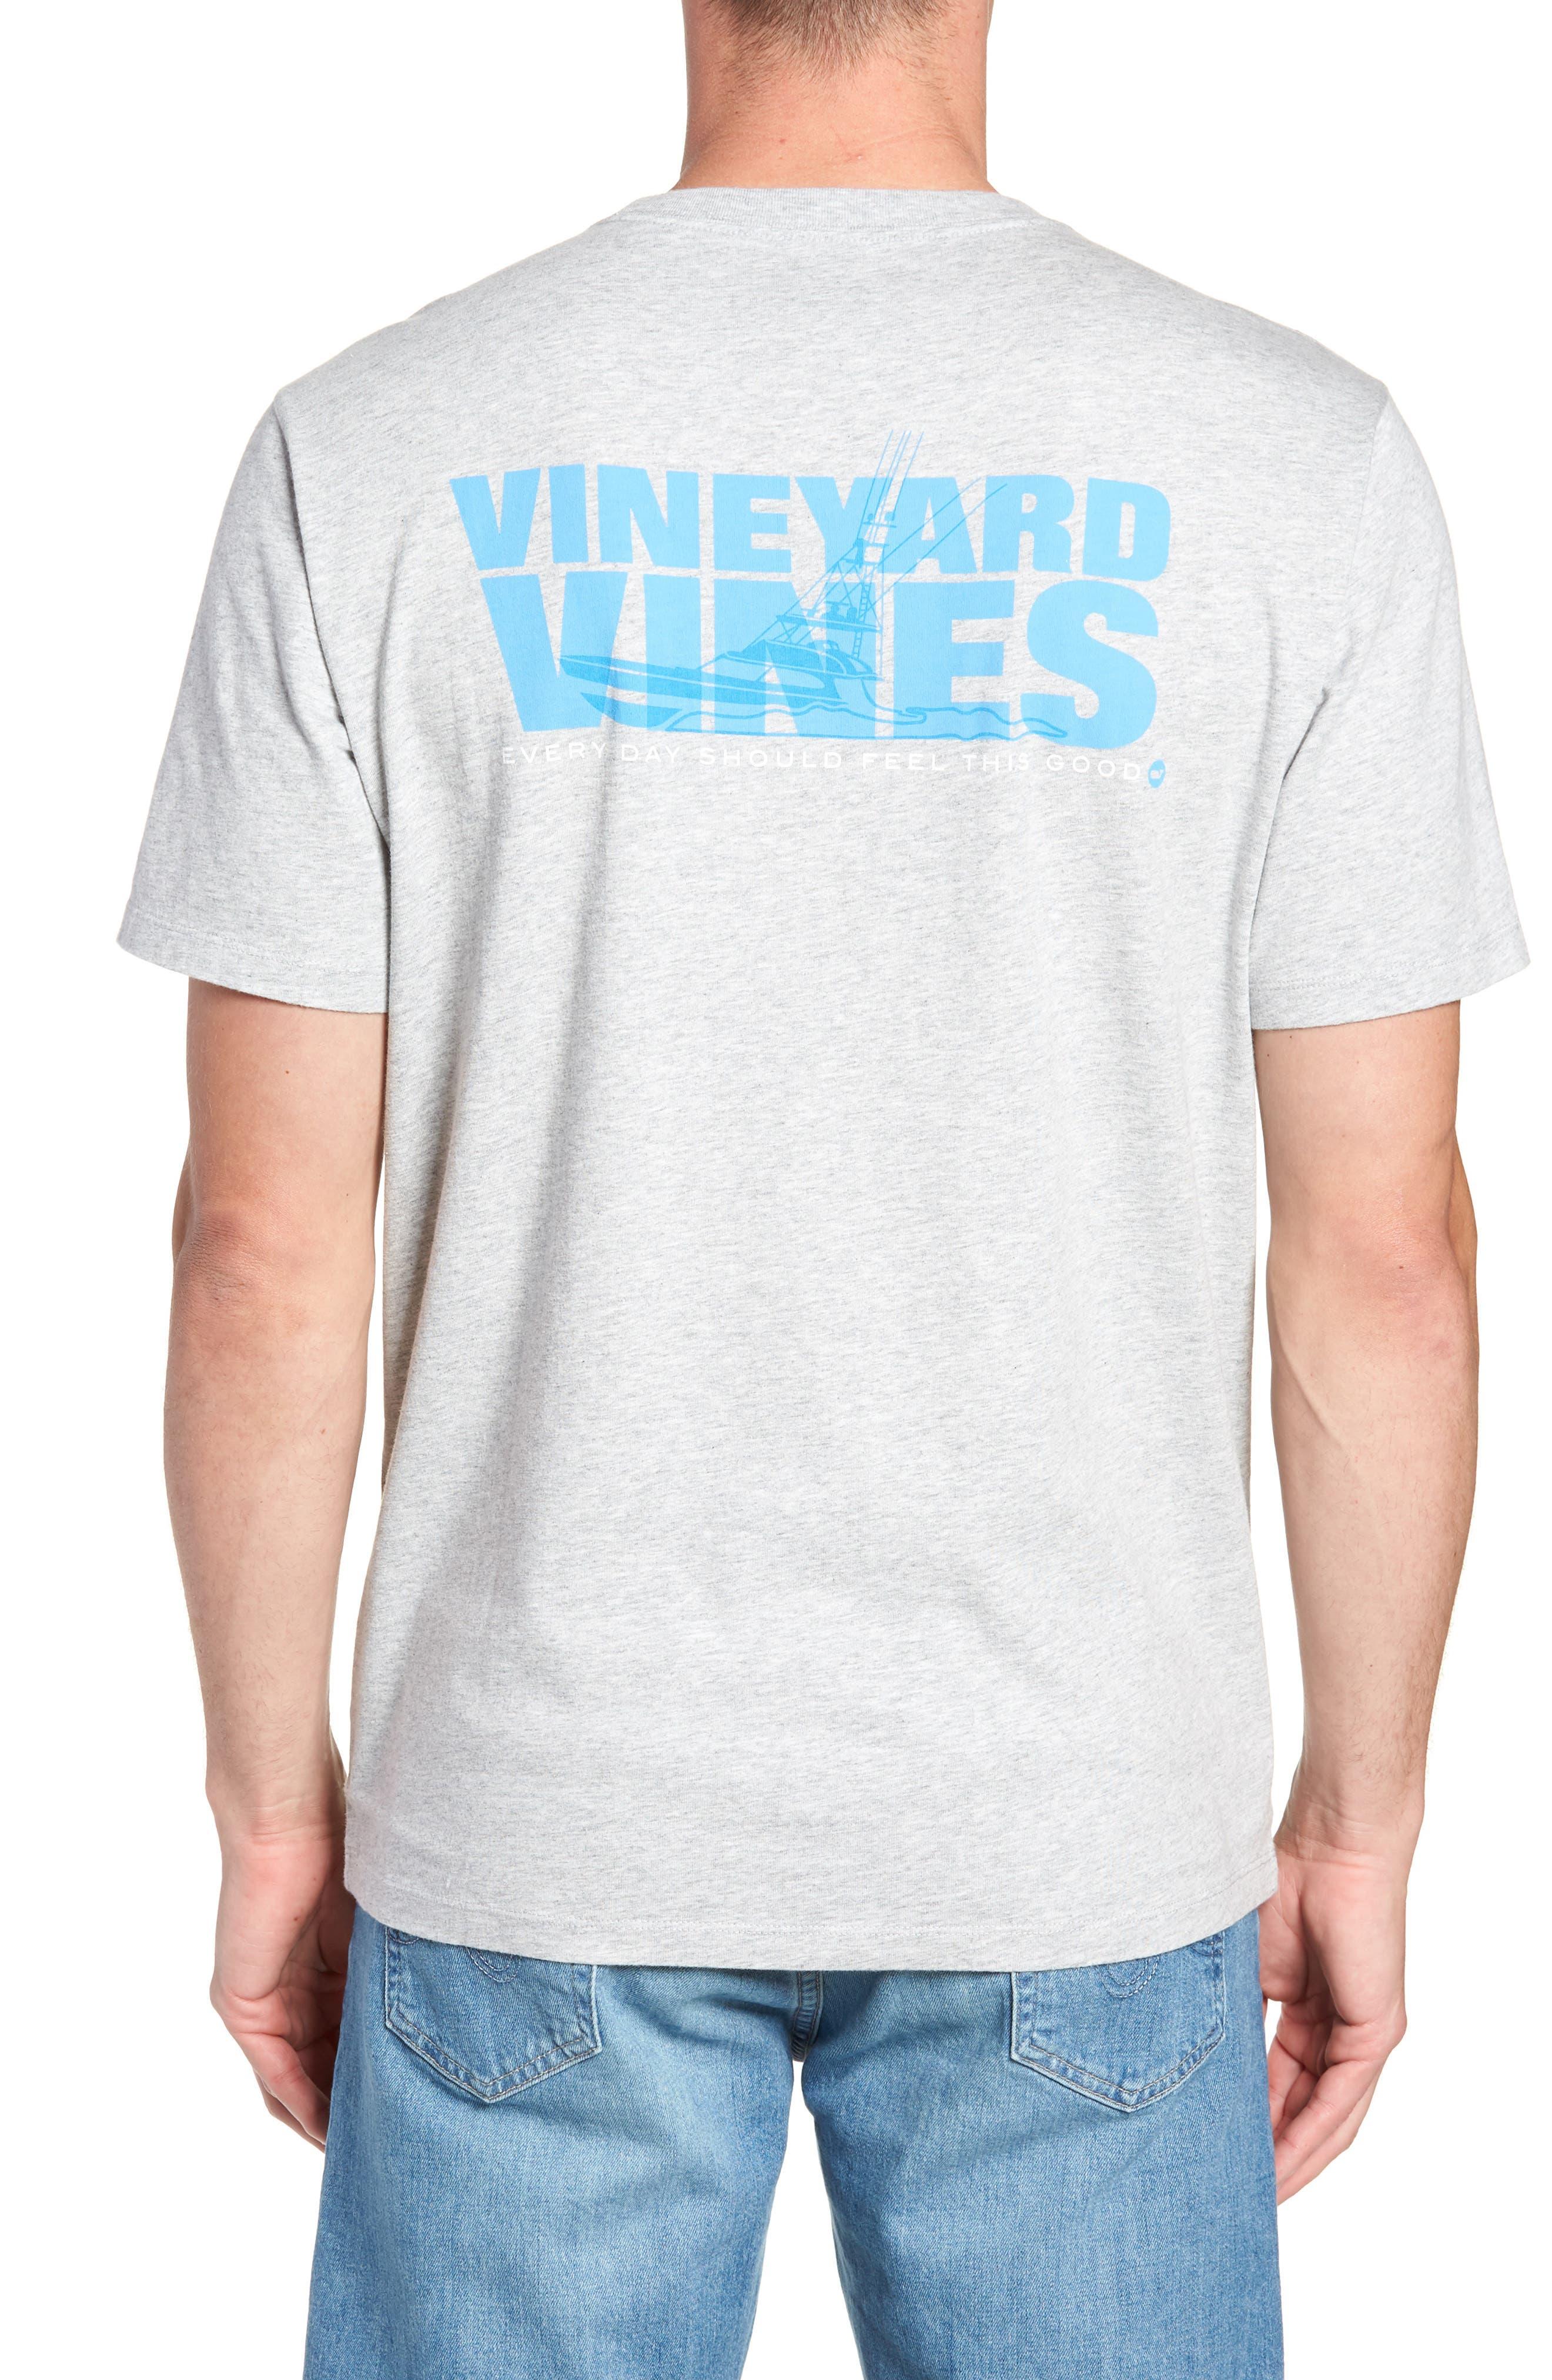 Knockout Sportfisher T-Shirt,                             Alternate thumbnail 2, color,                             GRAY HEATHER